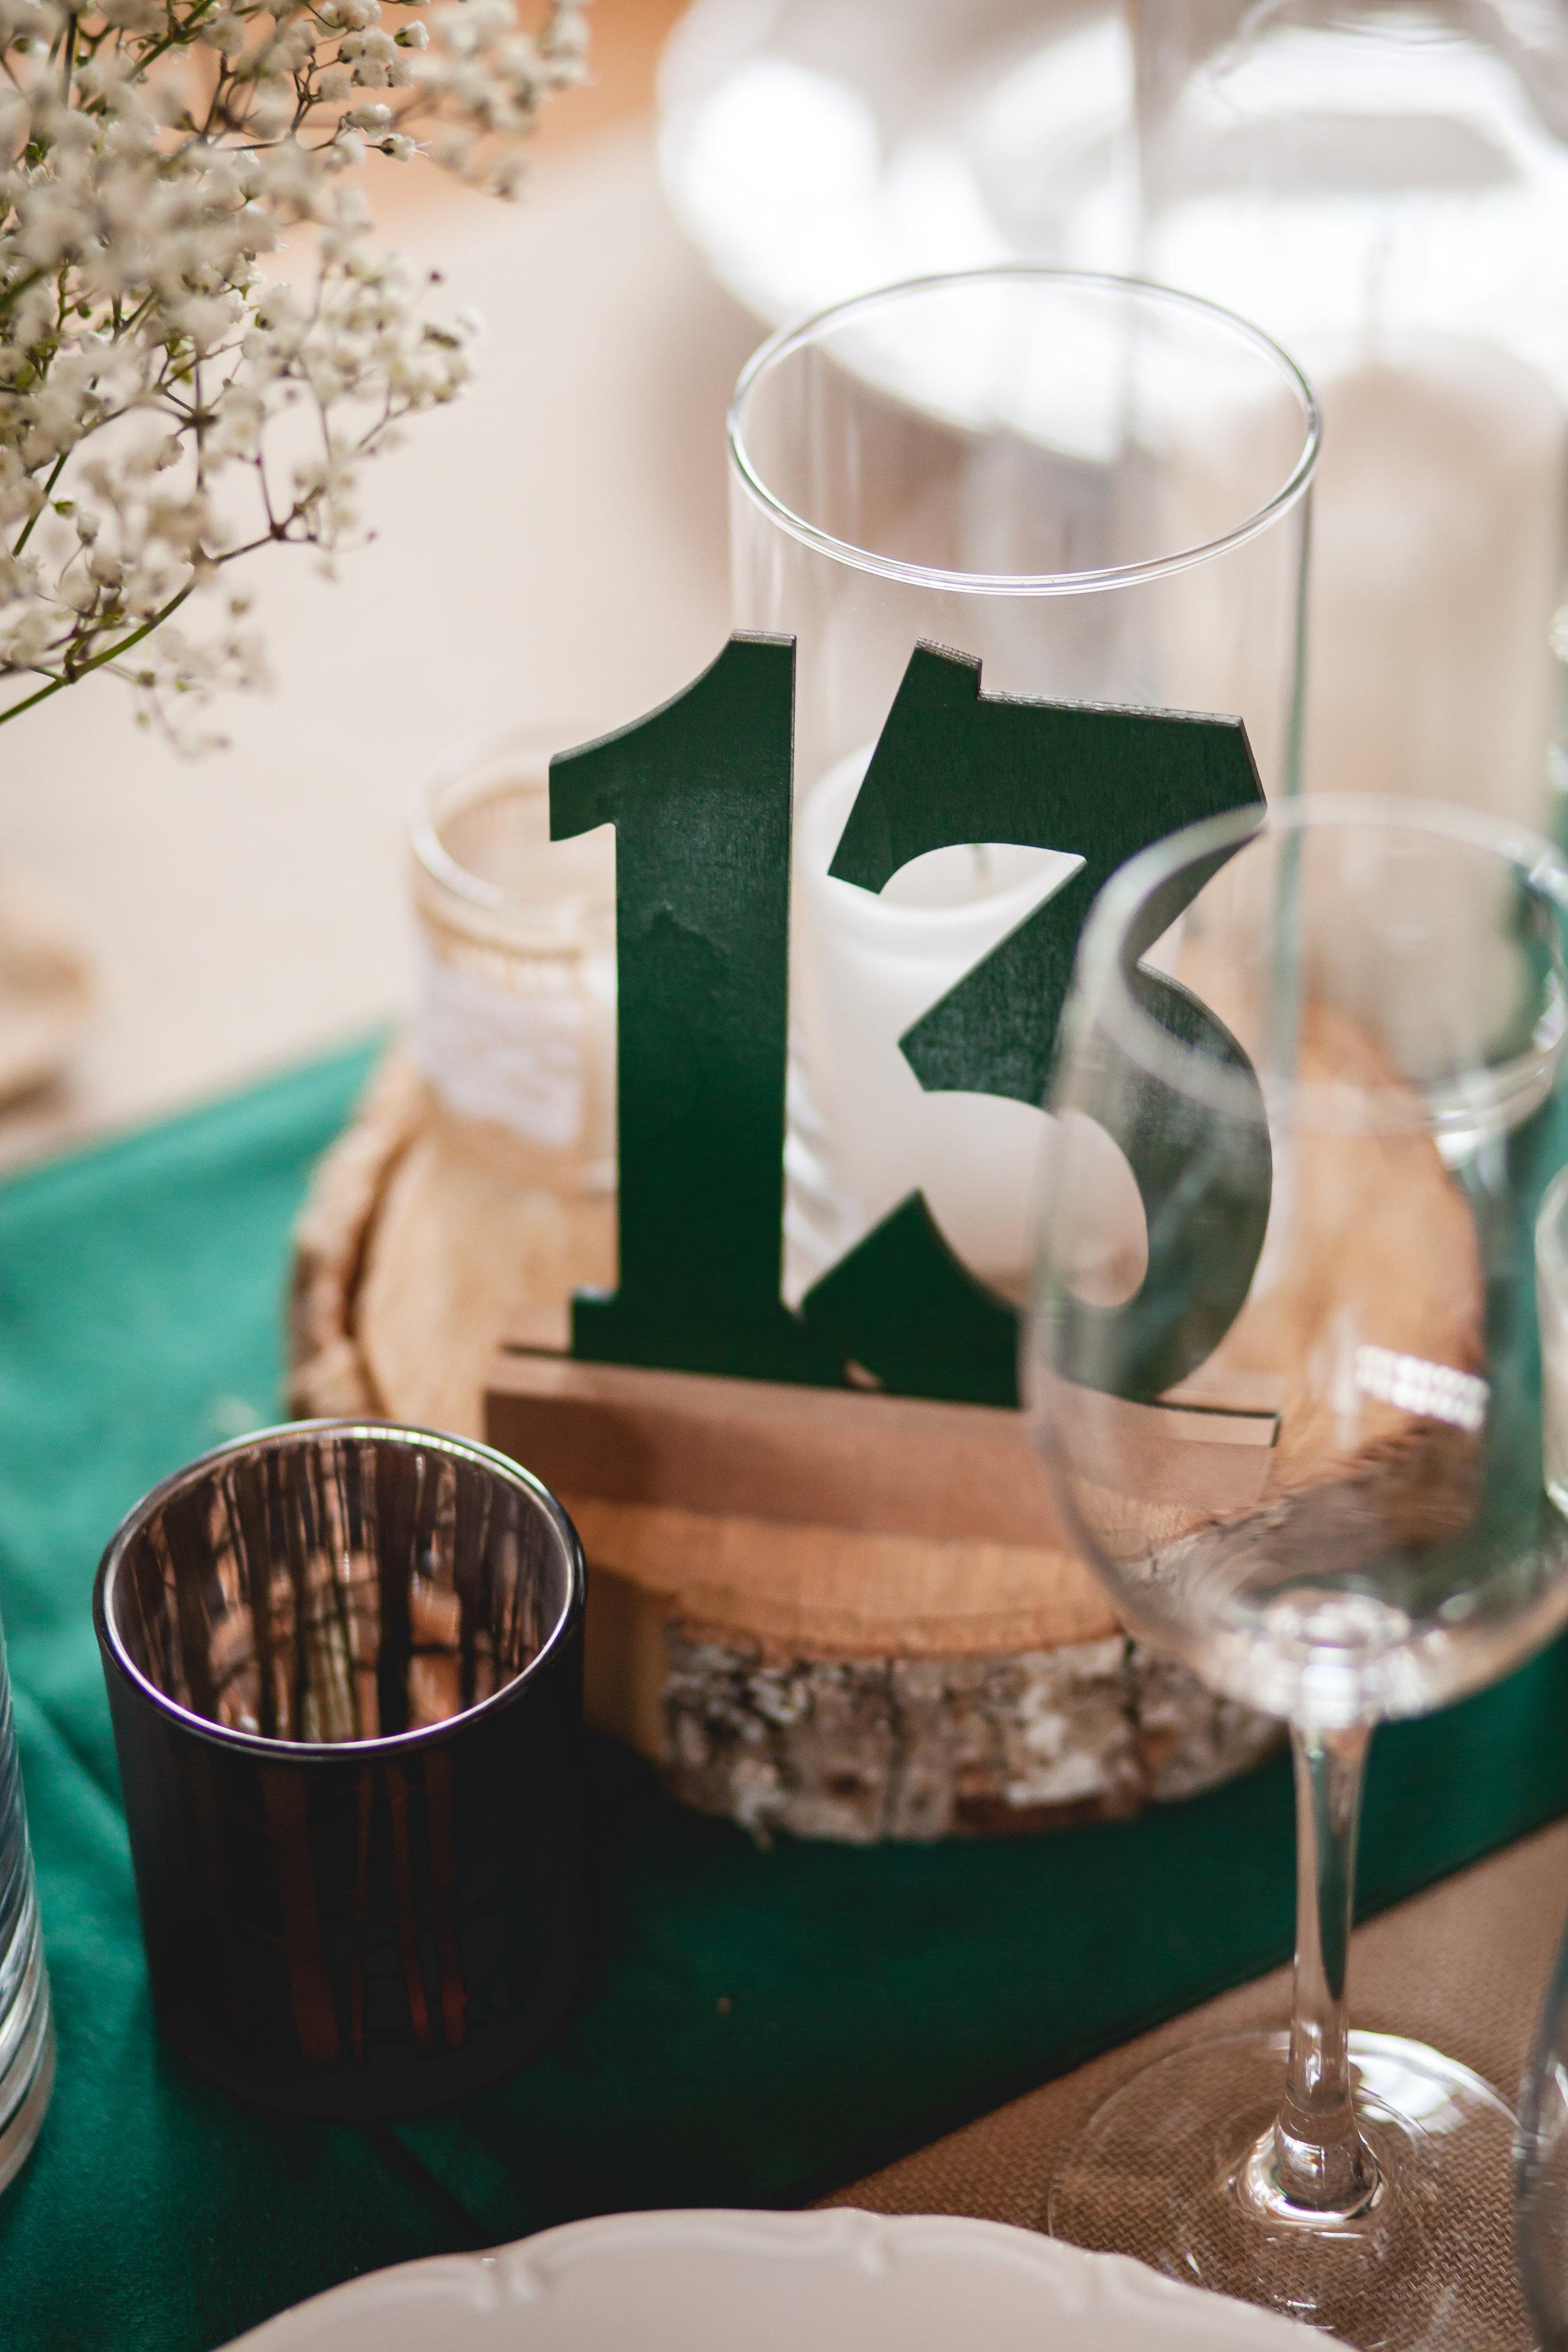 Amy D Photography- Winter Wedding- Tiffin Centre- Vintage Wedding Decor- Rustic Wedding- Wedding Decorations- Barrie Wedding Photography- Wedding Decor Ideas- Barrie Weddings (107 of 129).jpg